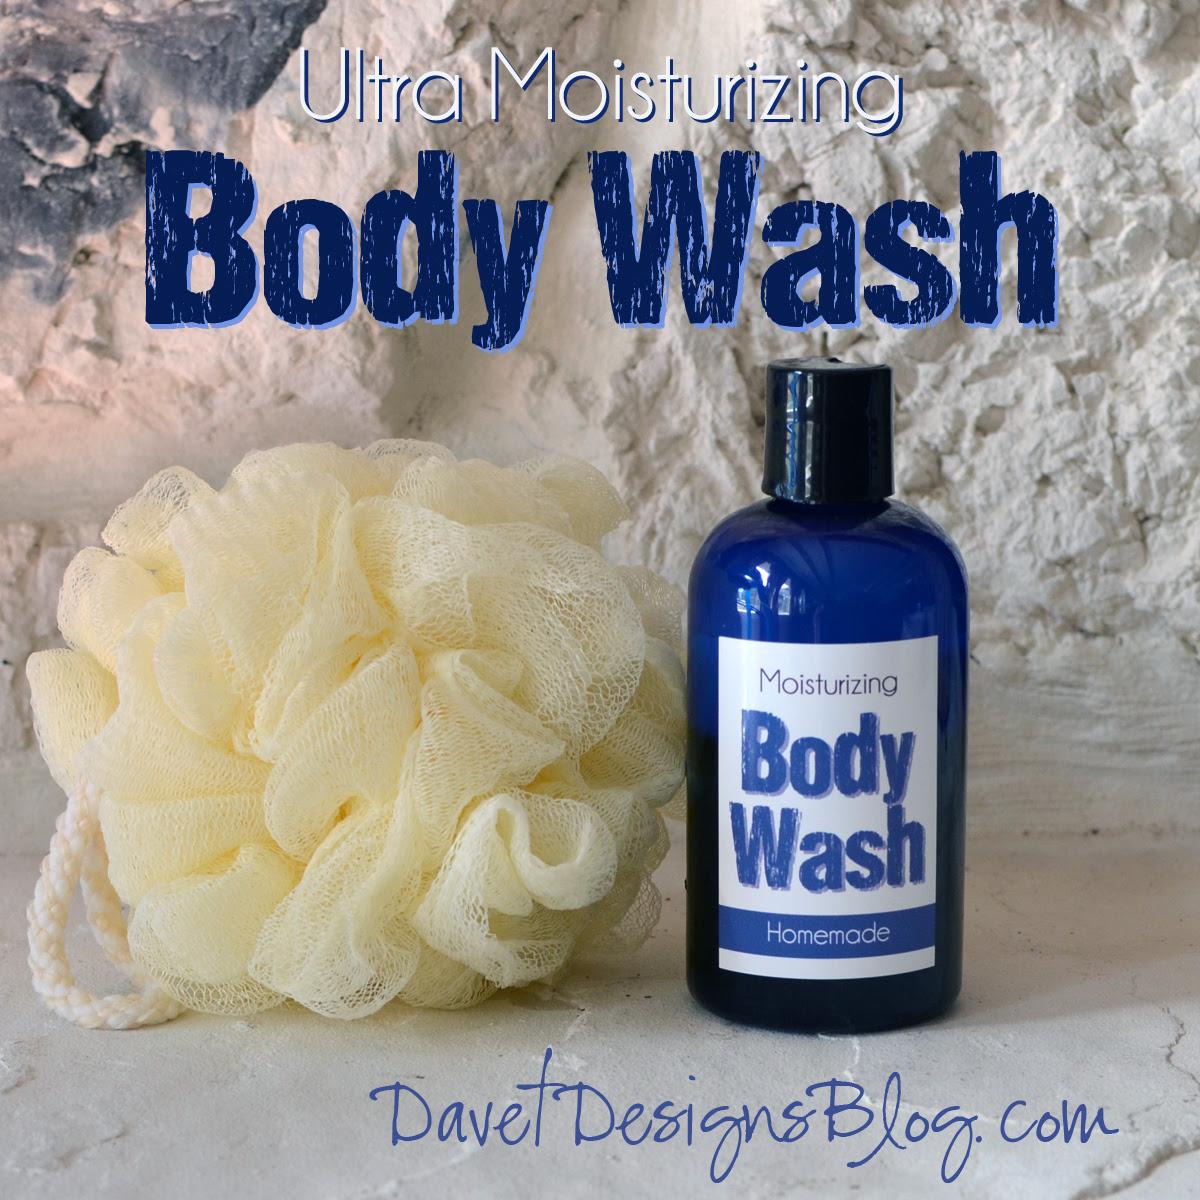 Homemade DIY Ultra Moisturizing Body Wash